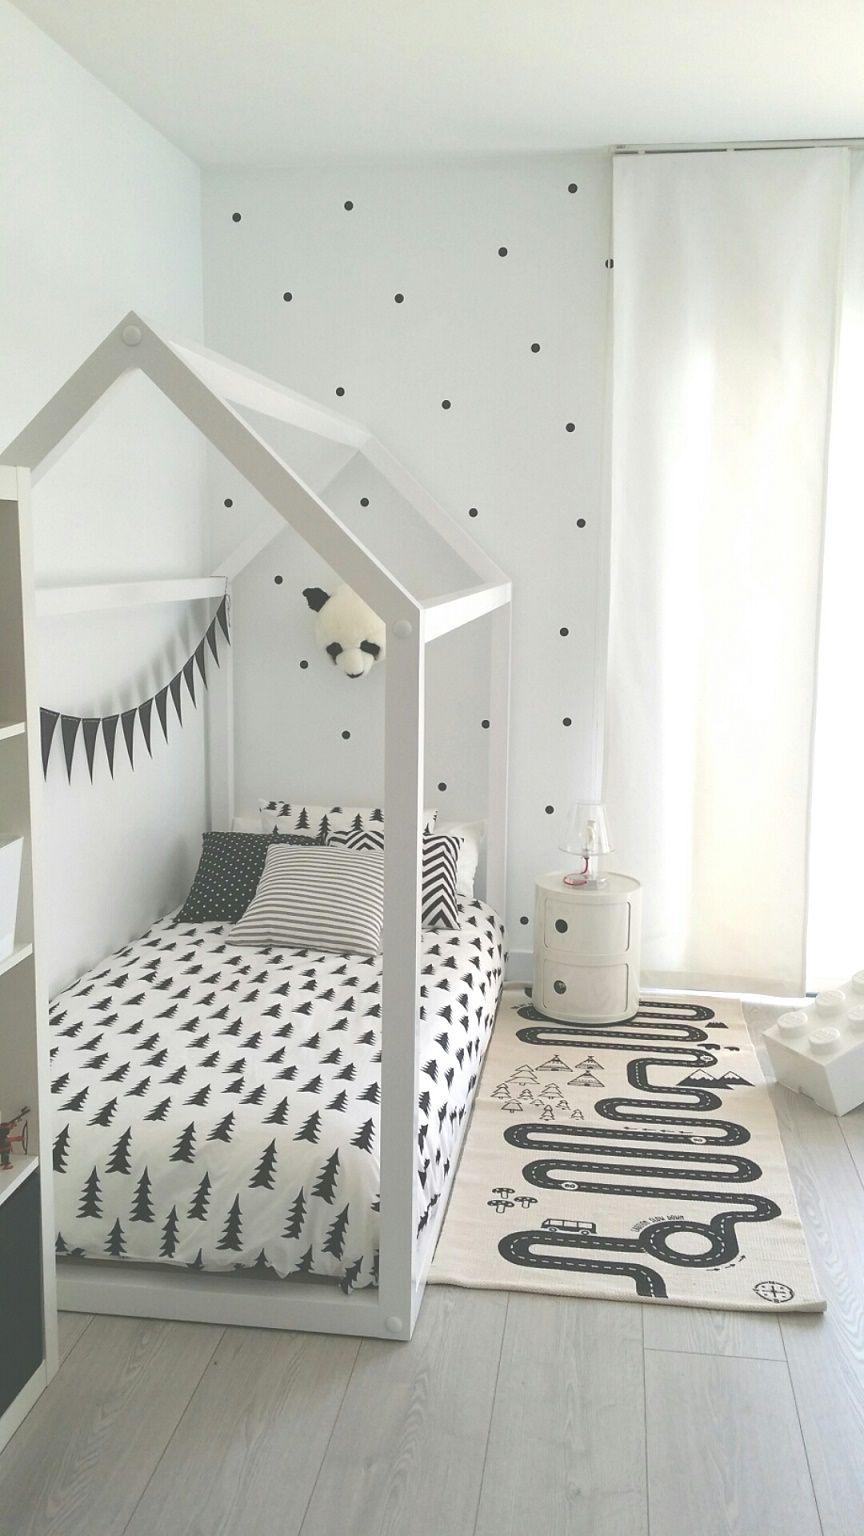 Habitacin infantil en blanco y negro DecoKids decoracin